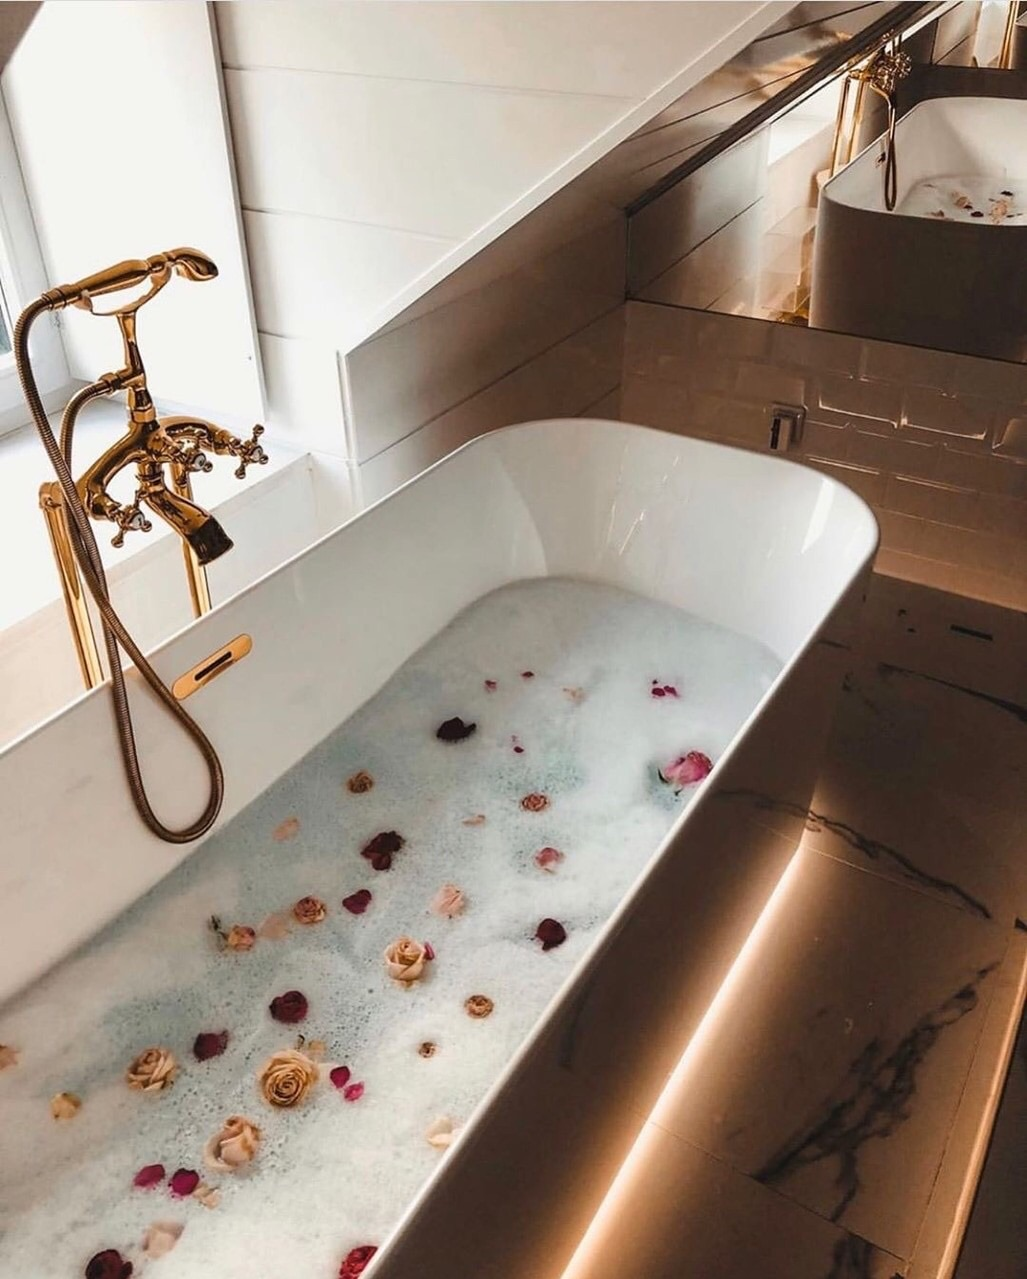 luxury, home, and bathroom image